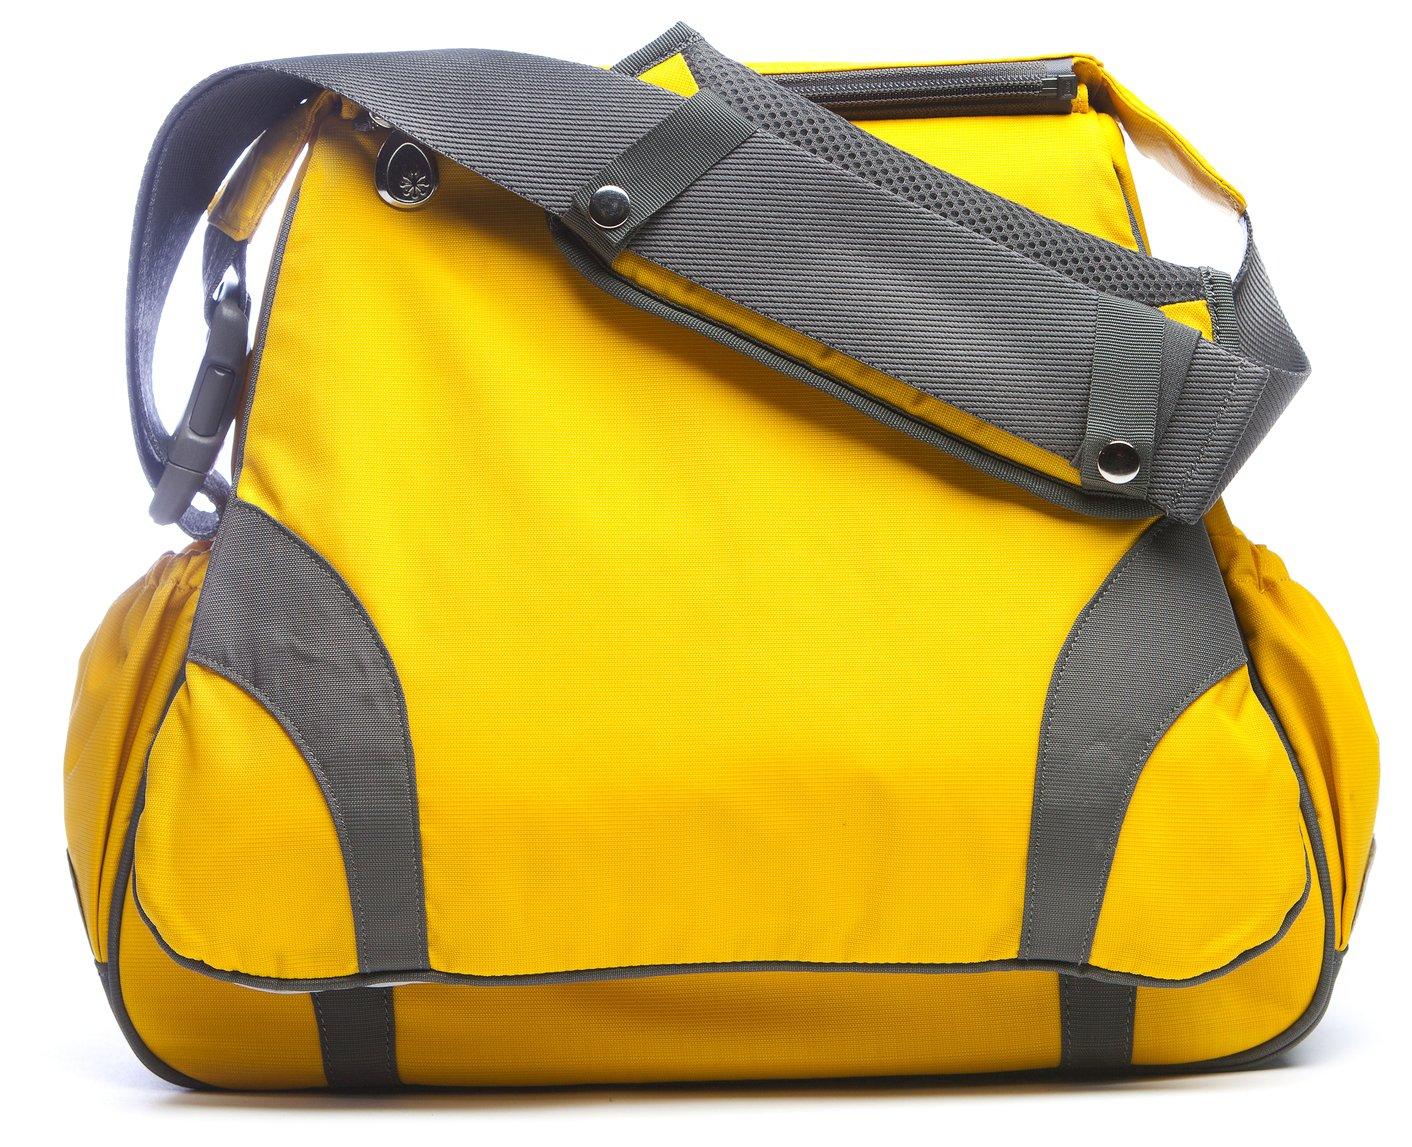 Go-Go Babyz Sidekick Bliss Diaper Bag Yellow (並行輸入) B005KQ3N4Y